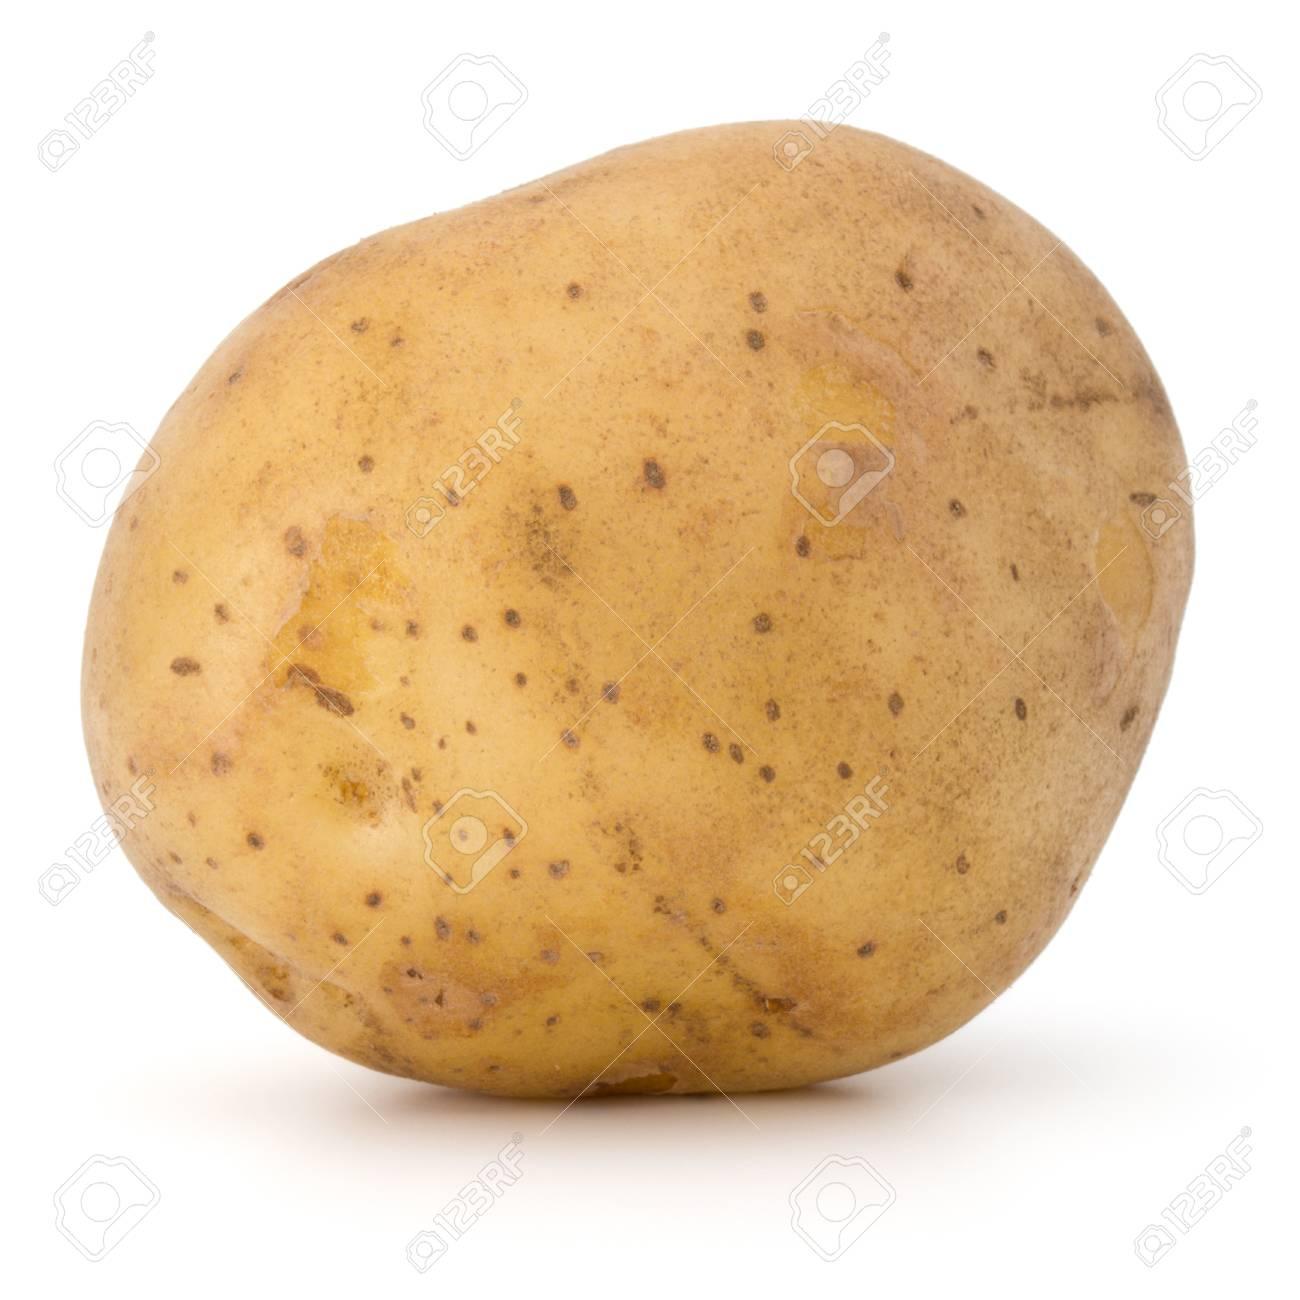 new potato tuber isolated on white background cutout - 45152458